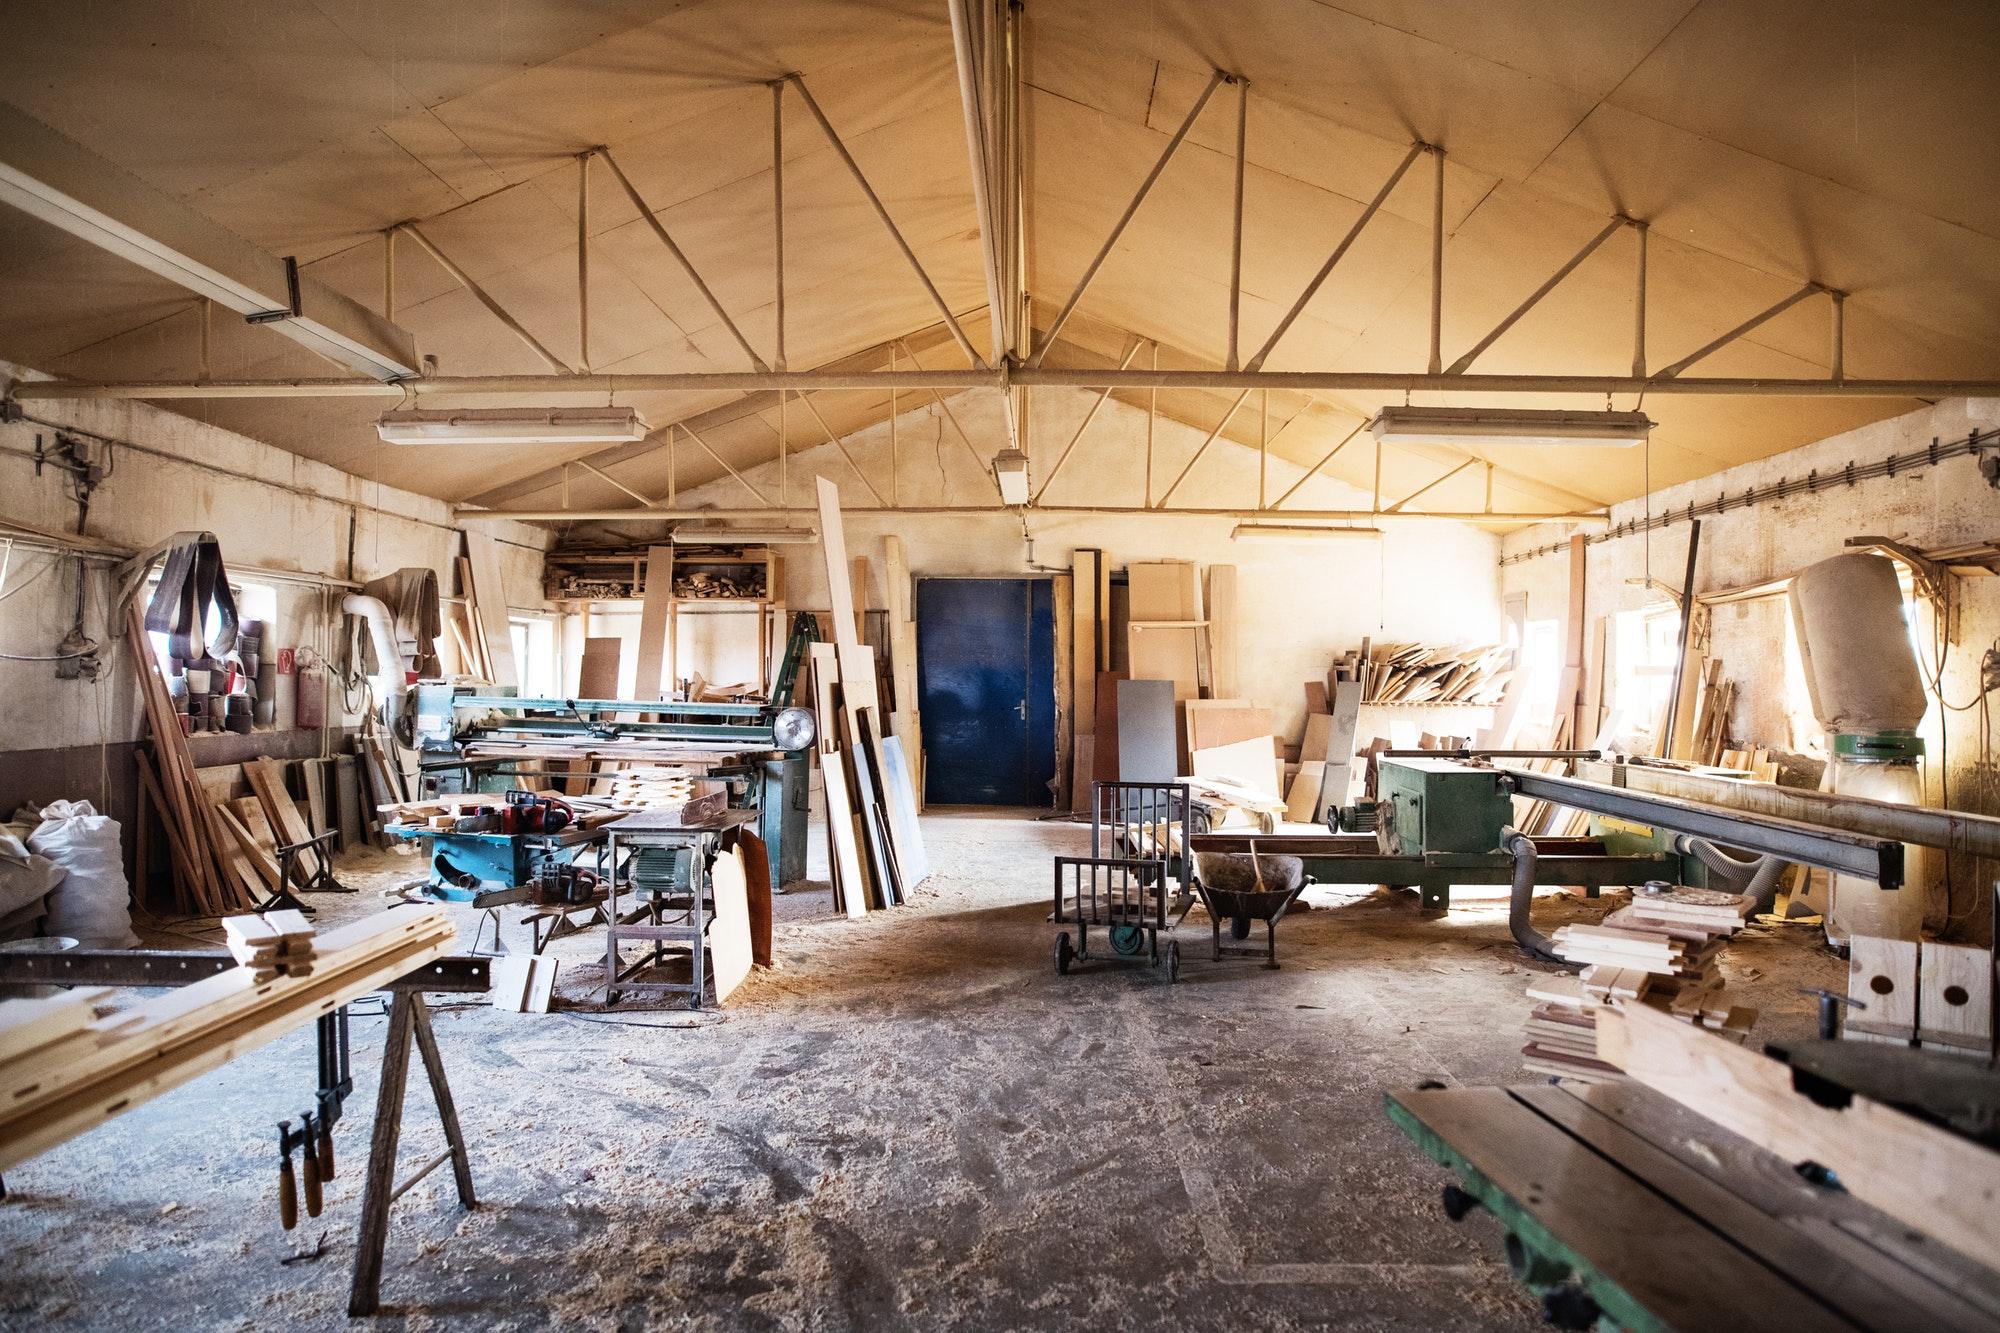 An interior of carpentry workshop.